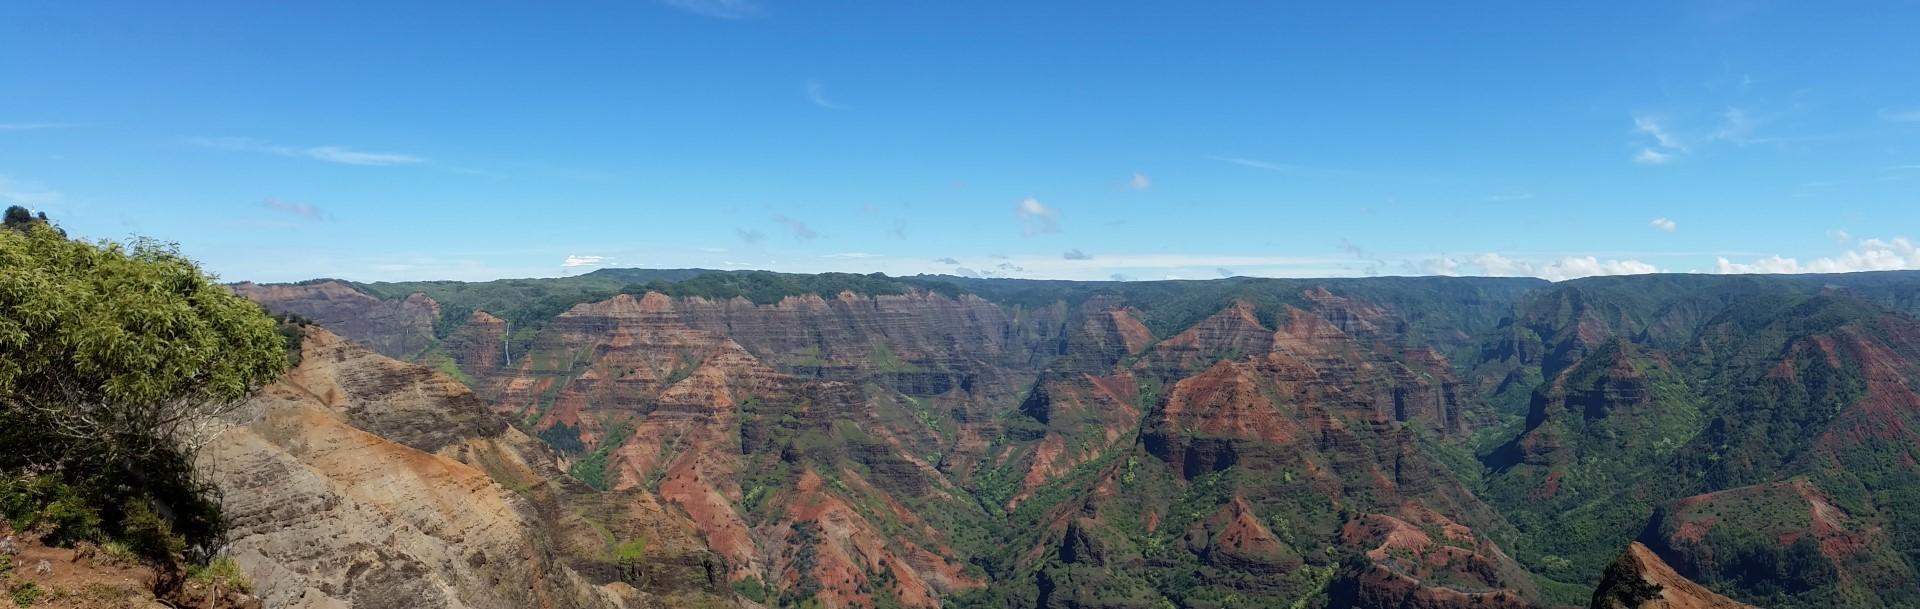 Hawaii Tag 25: Waimea Canyon, Kokee State Park, Kalalau Valley Lookout (2014-10-20)